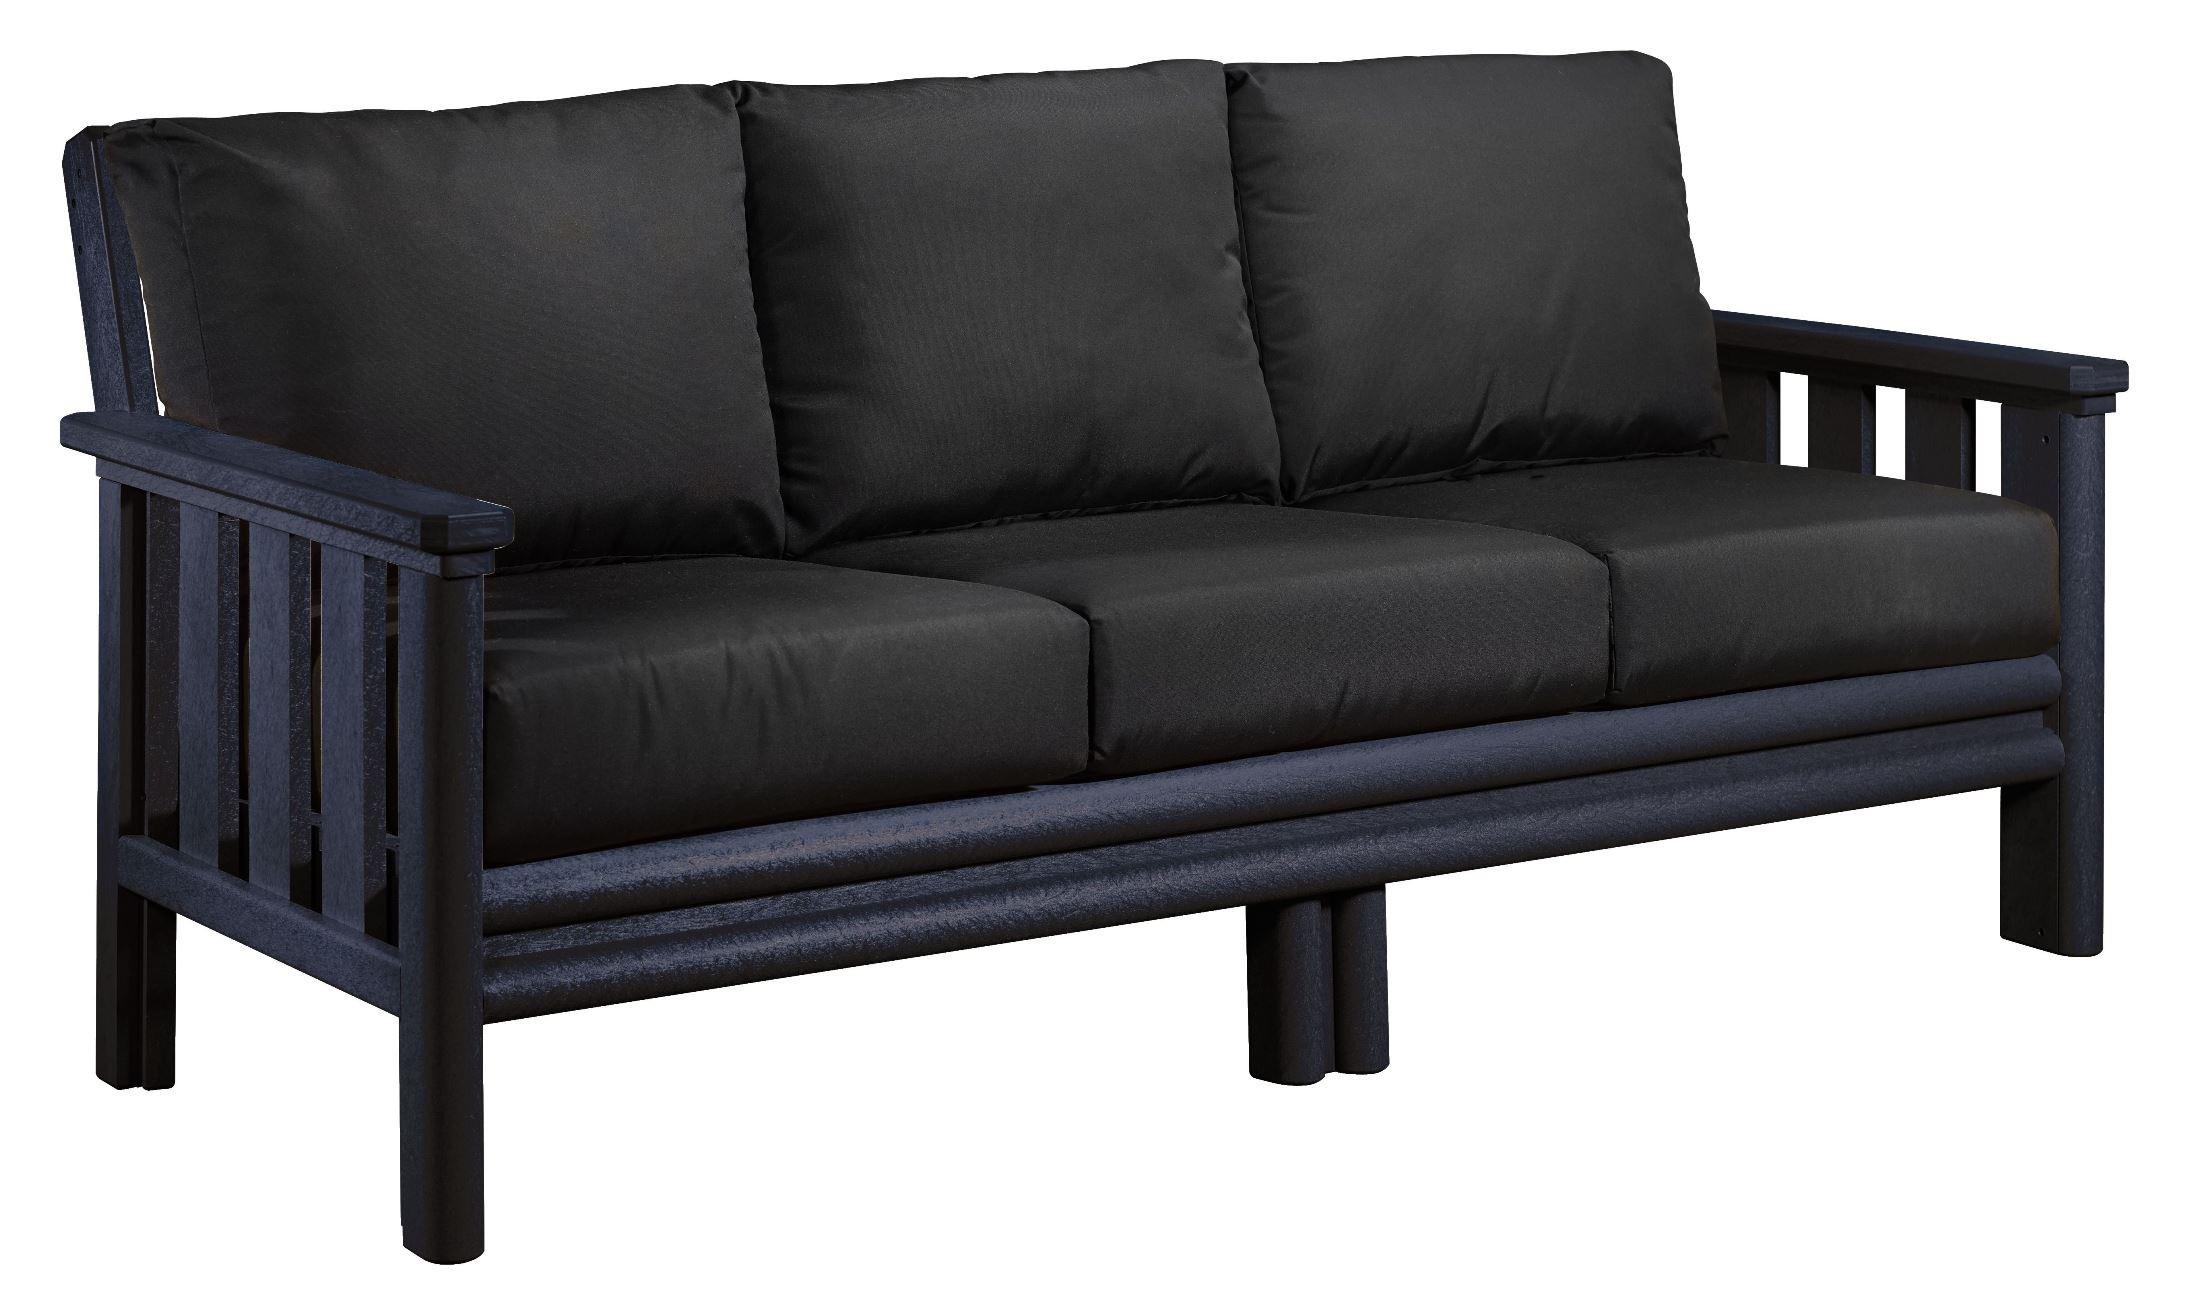 Stratford Black Sofa With Black Sunbrella Cushions From Cr